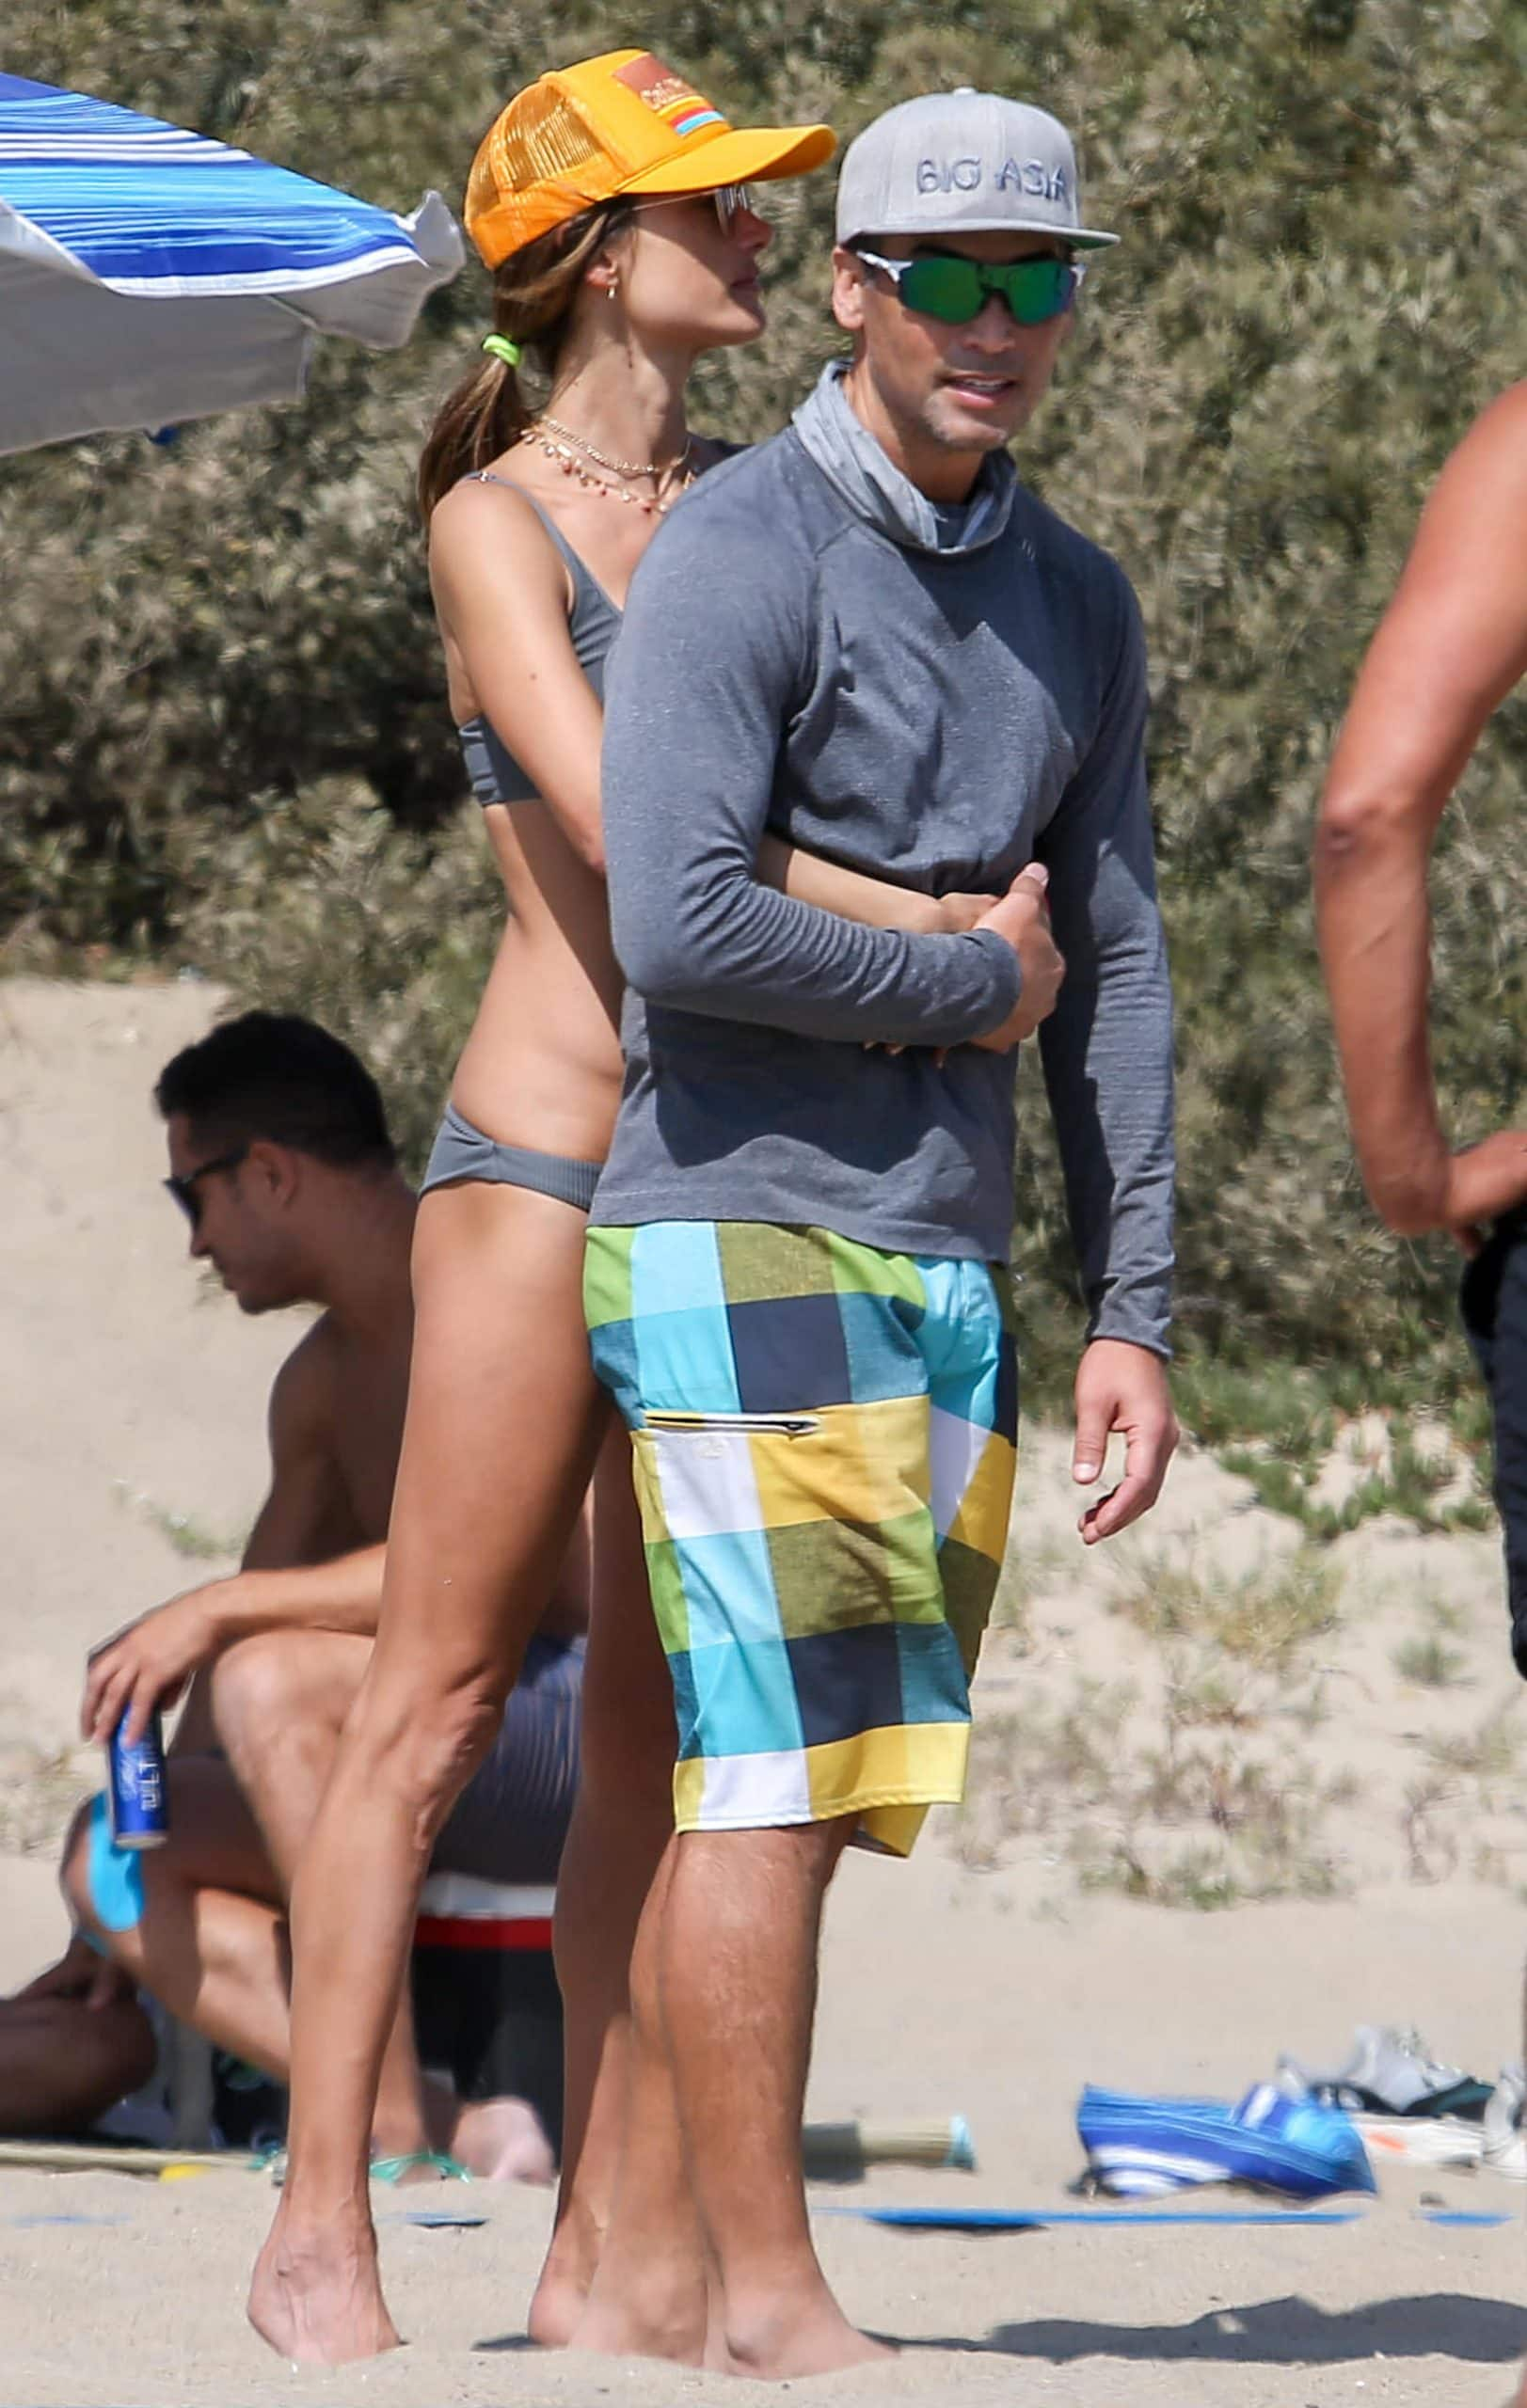 Alessandra Ambrosio hugs her boyfriend Richard Lee from behind